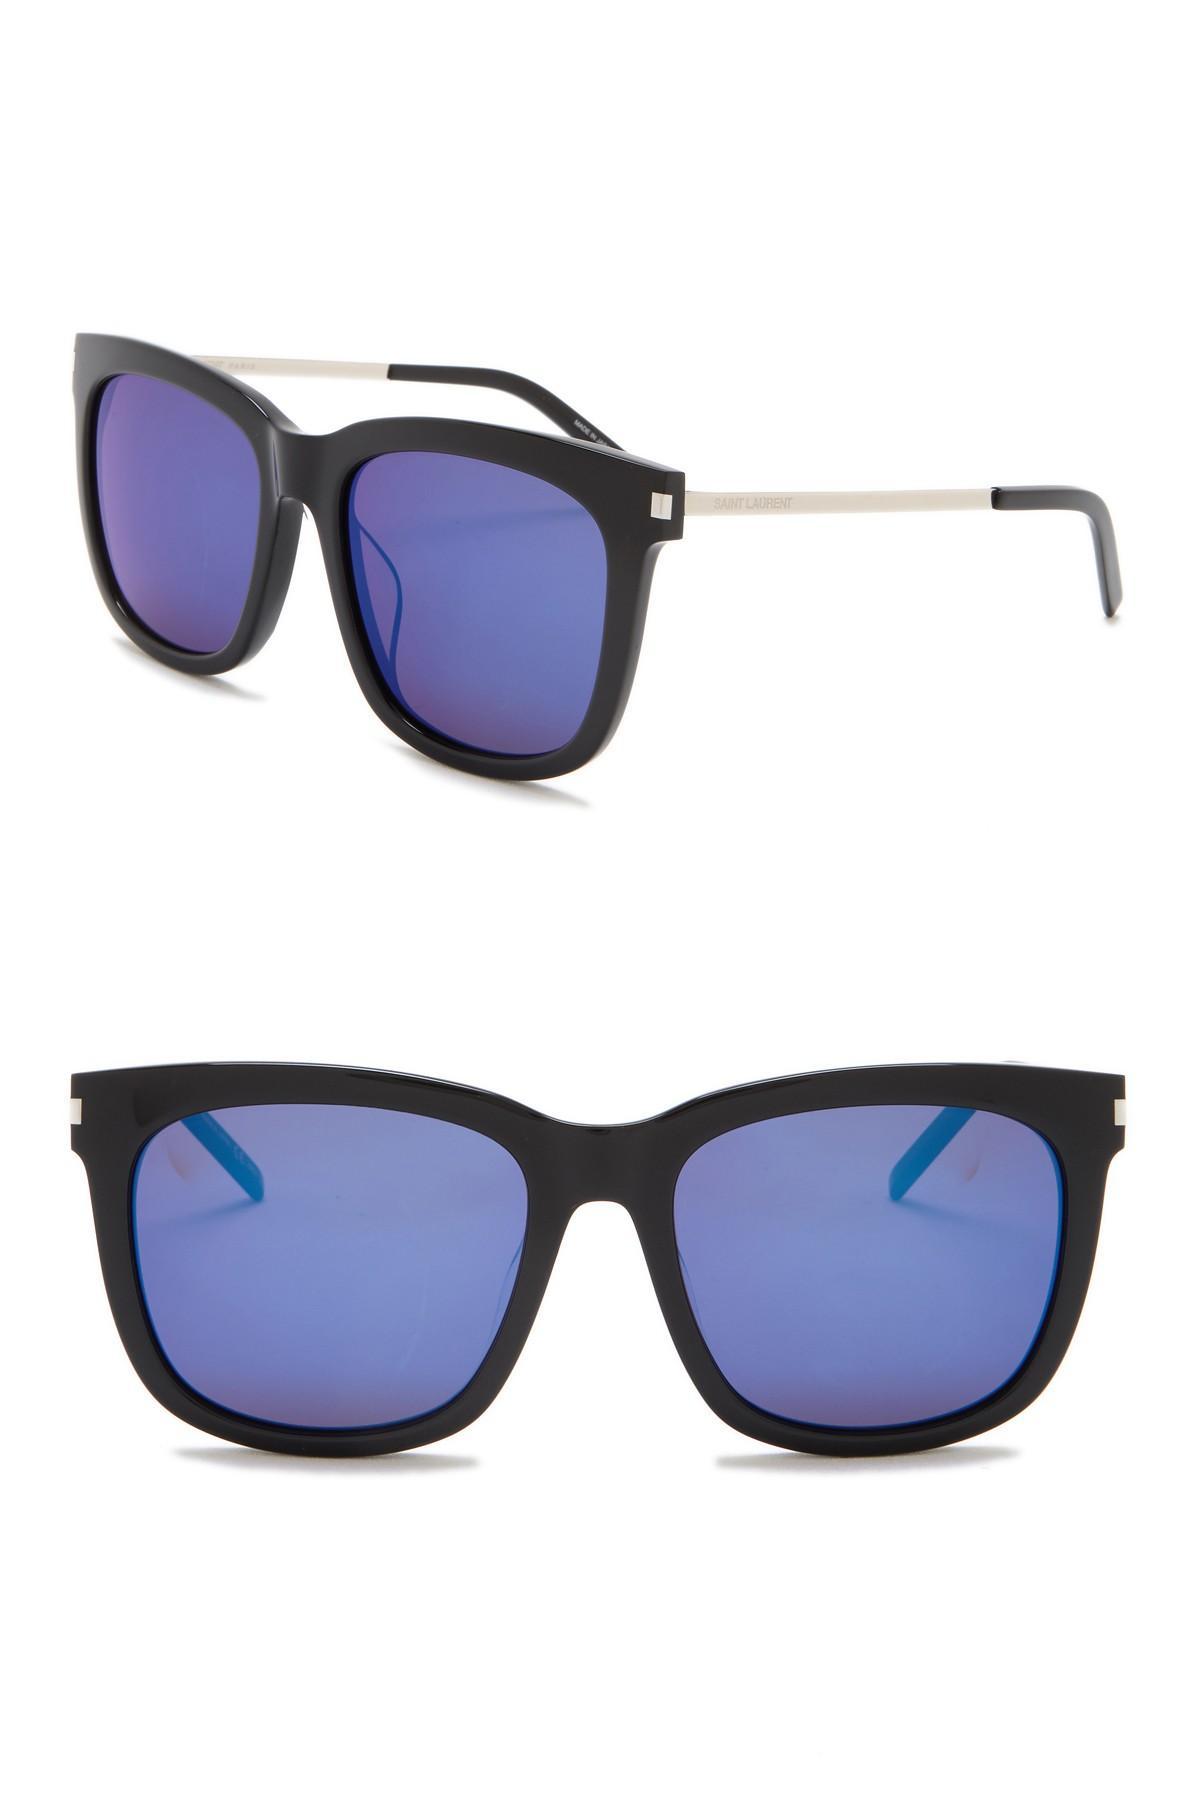 76cf5a3b1b Lyst - Saint Laurent 56mm Square Sunglasses in Black for Men